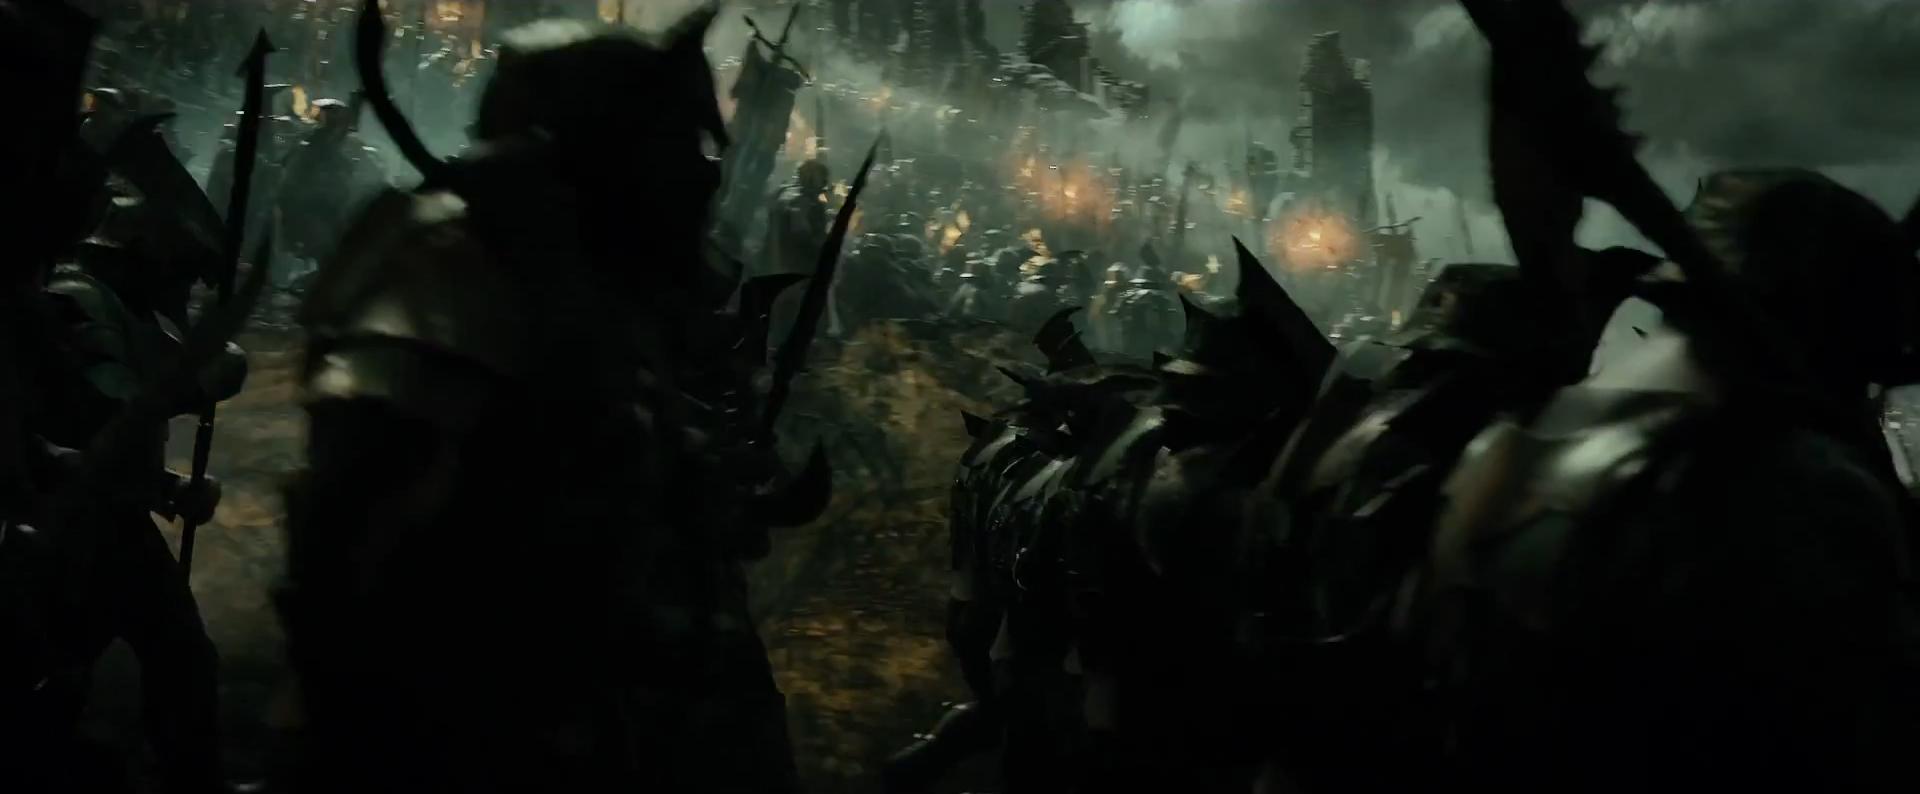 The Hobbit the Desolation of Smaug Cast